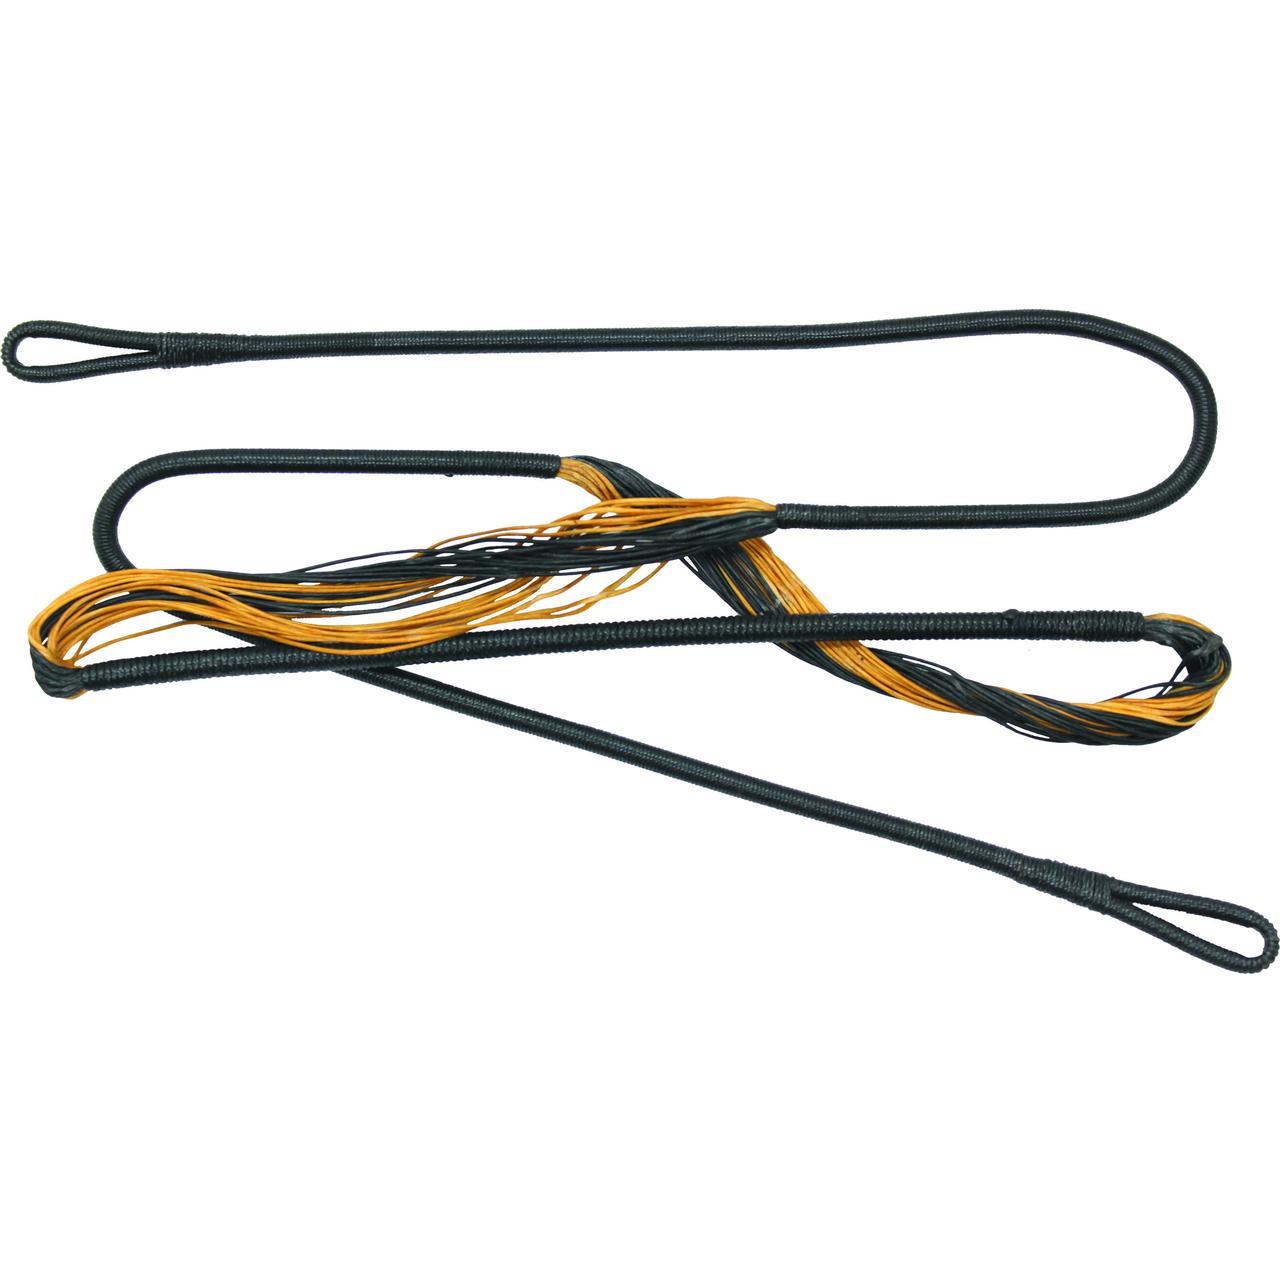 Jaguar Recurve Original Crossbow Replacement String